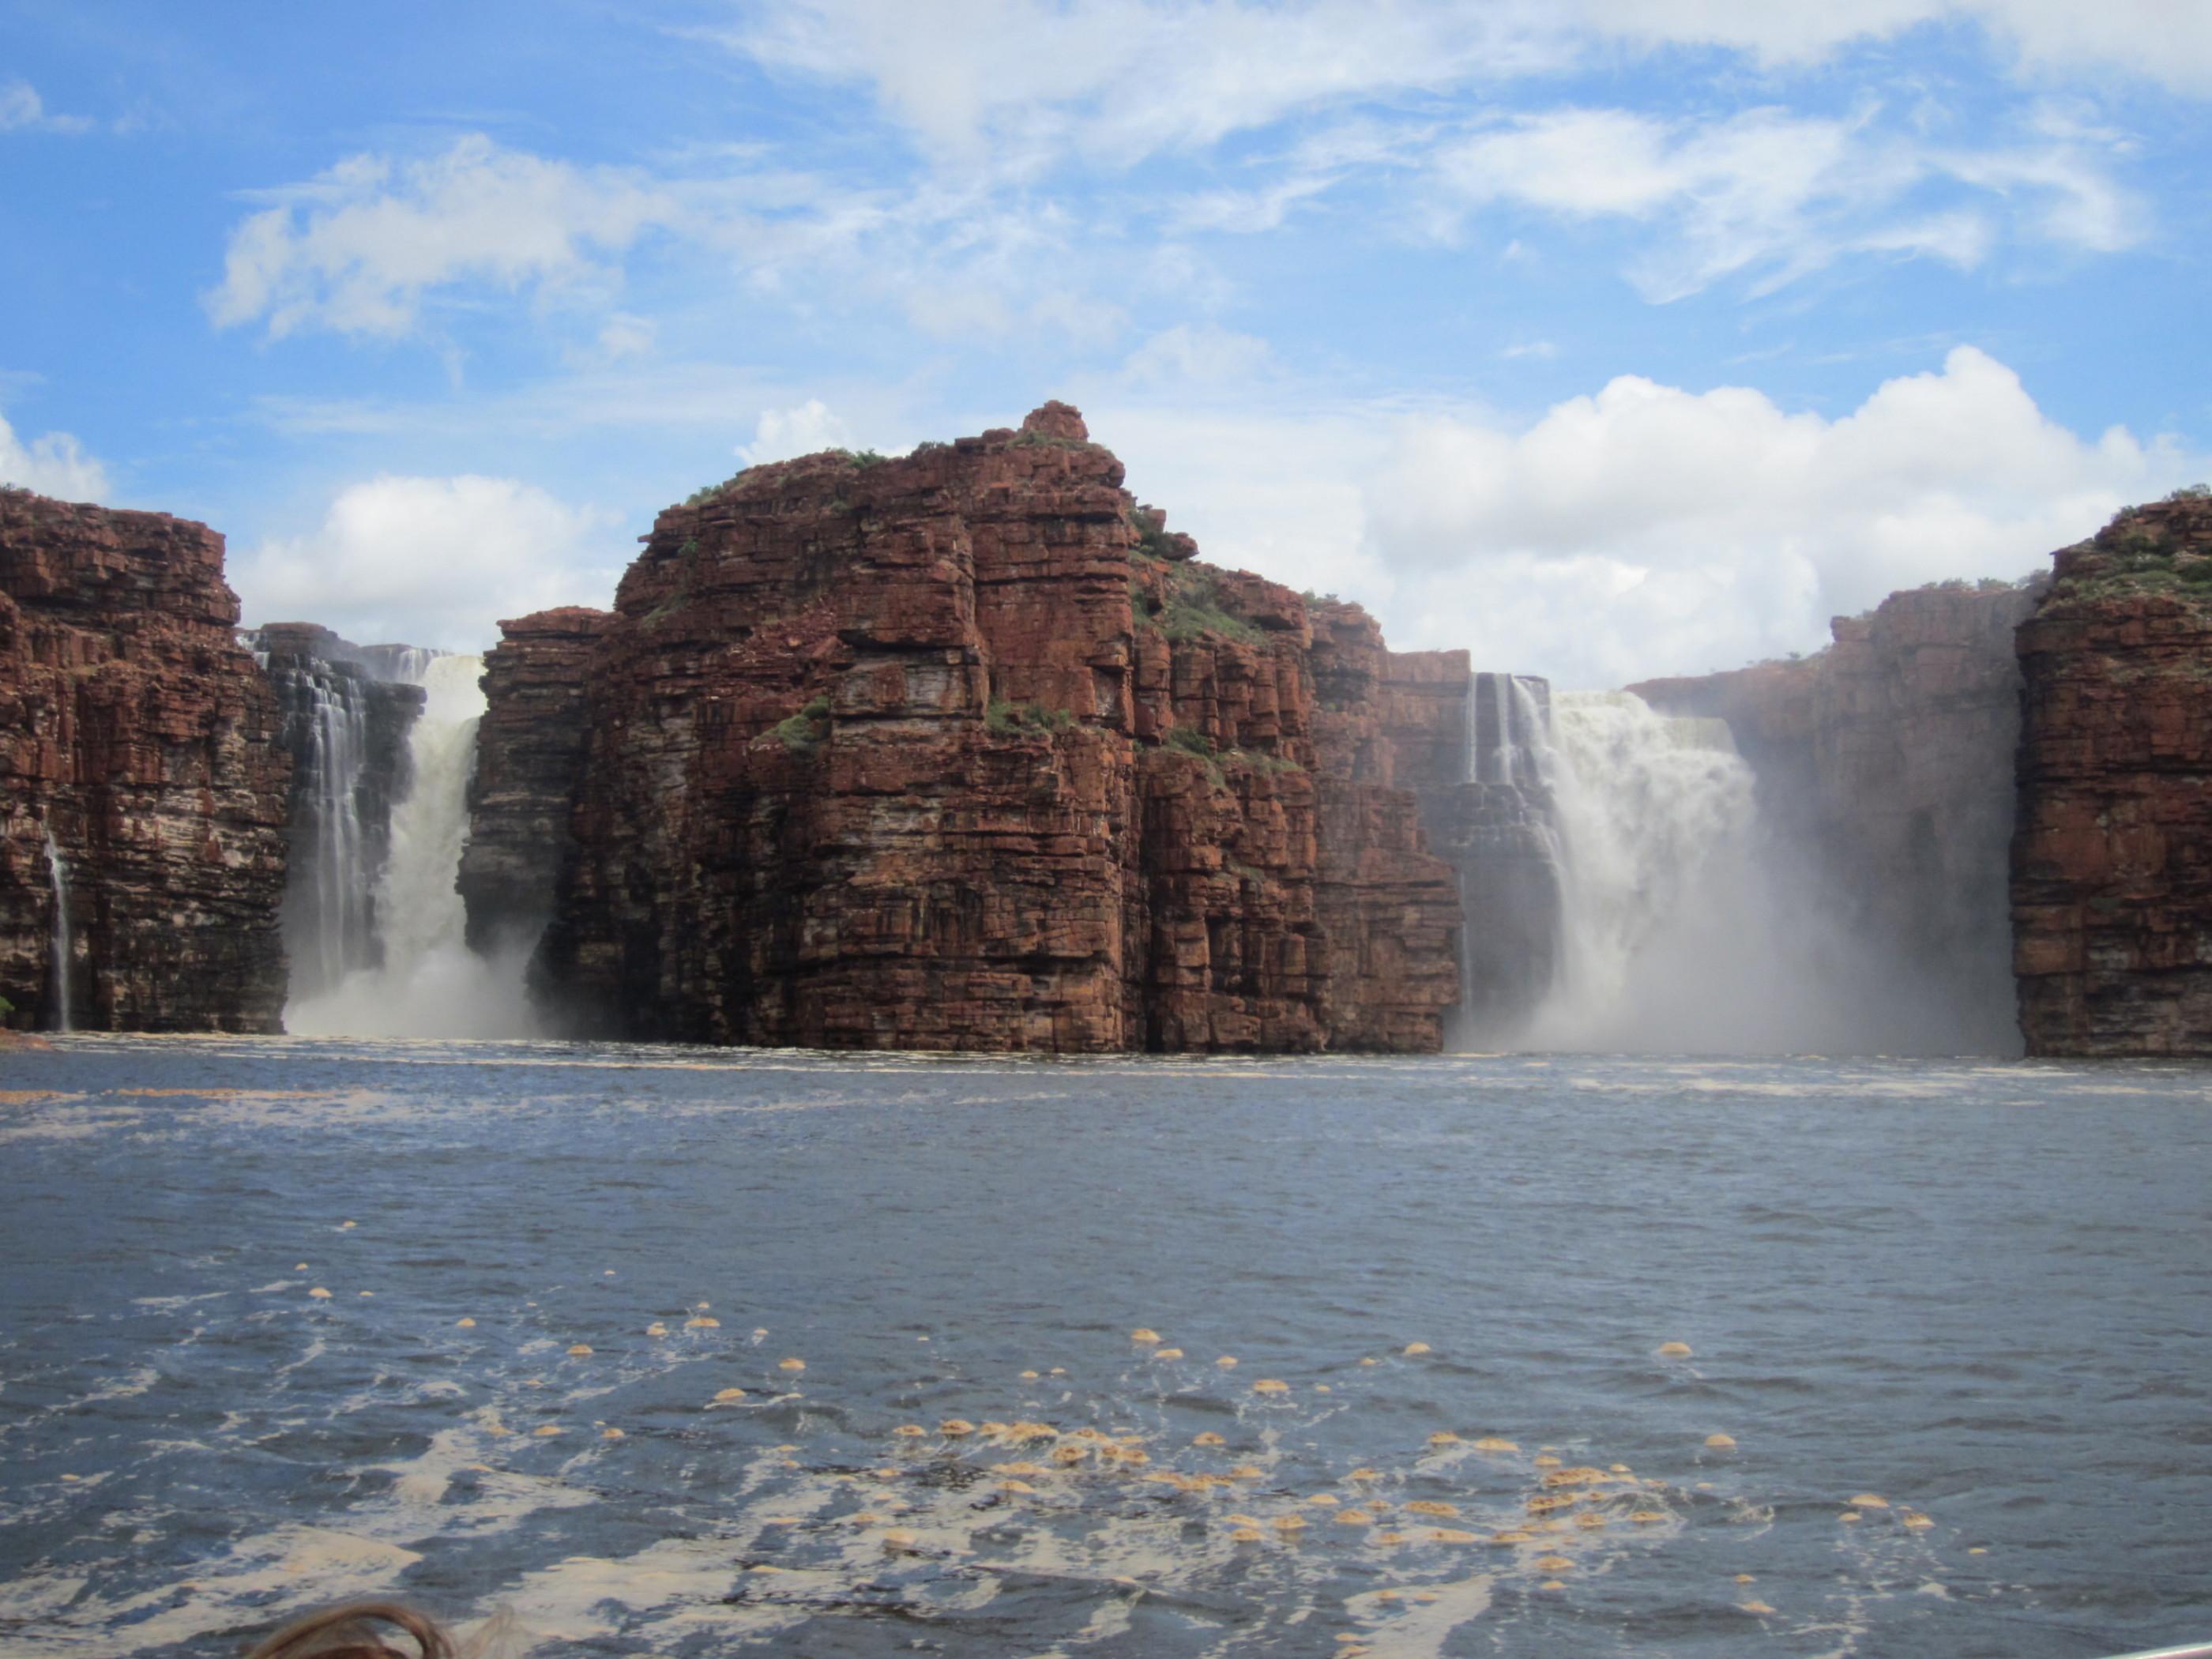 KGFalls wa tallest Falls beginning of season